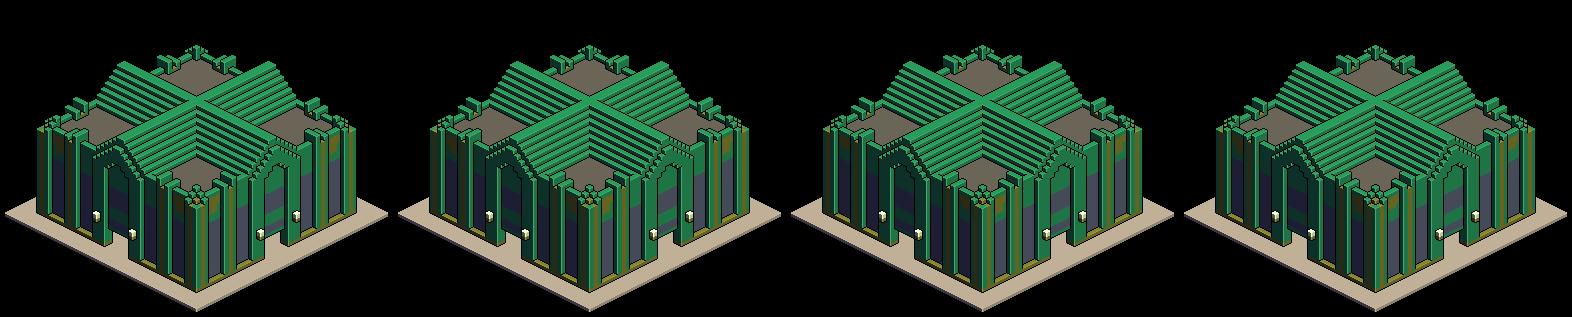 Emerald Warehouse